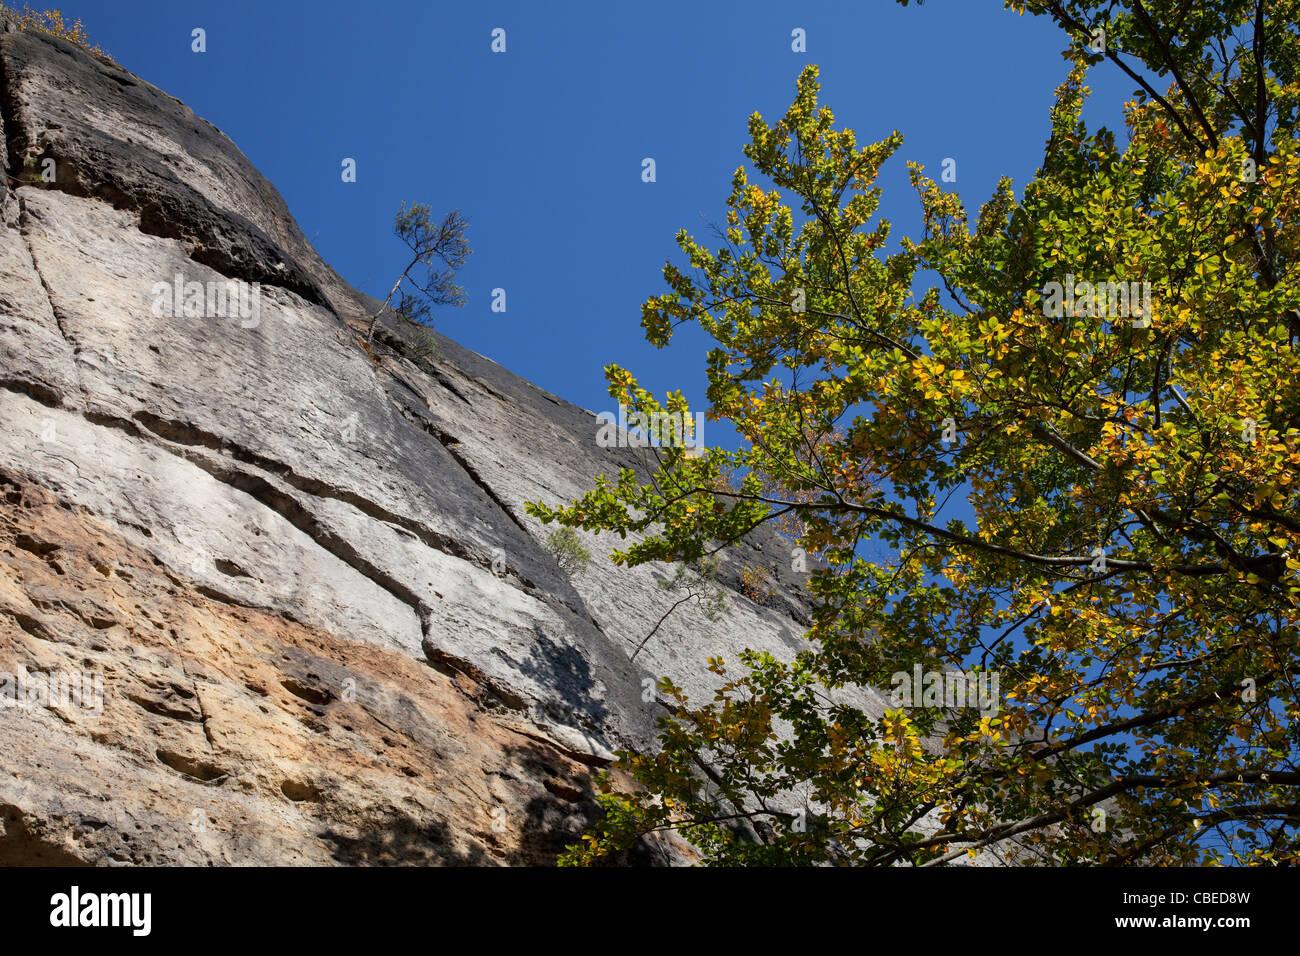 Sandstone rocks at the Kirnitzsch Valley. Elbe Sandstone Mountains, Saxony, Germany. - Stock Image